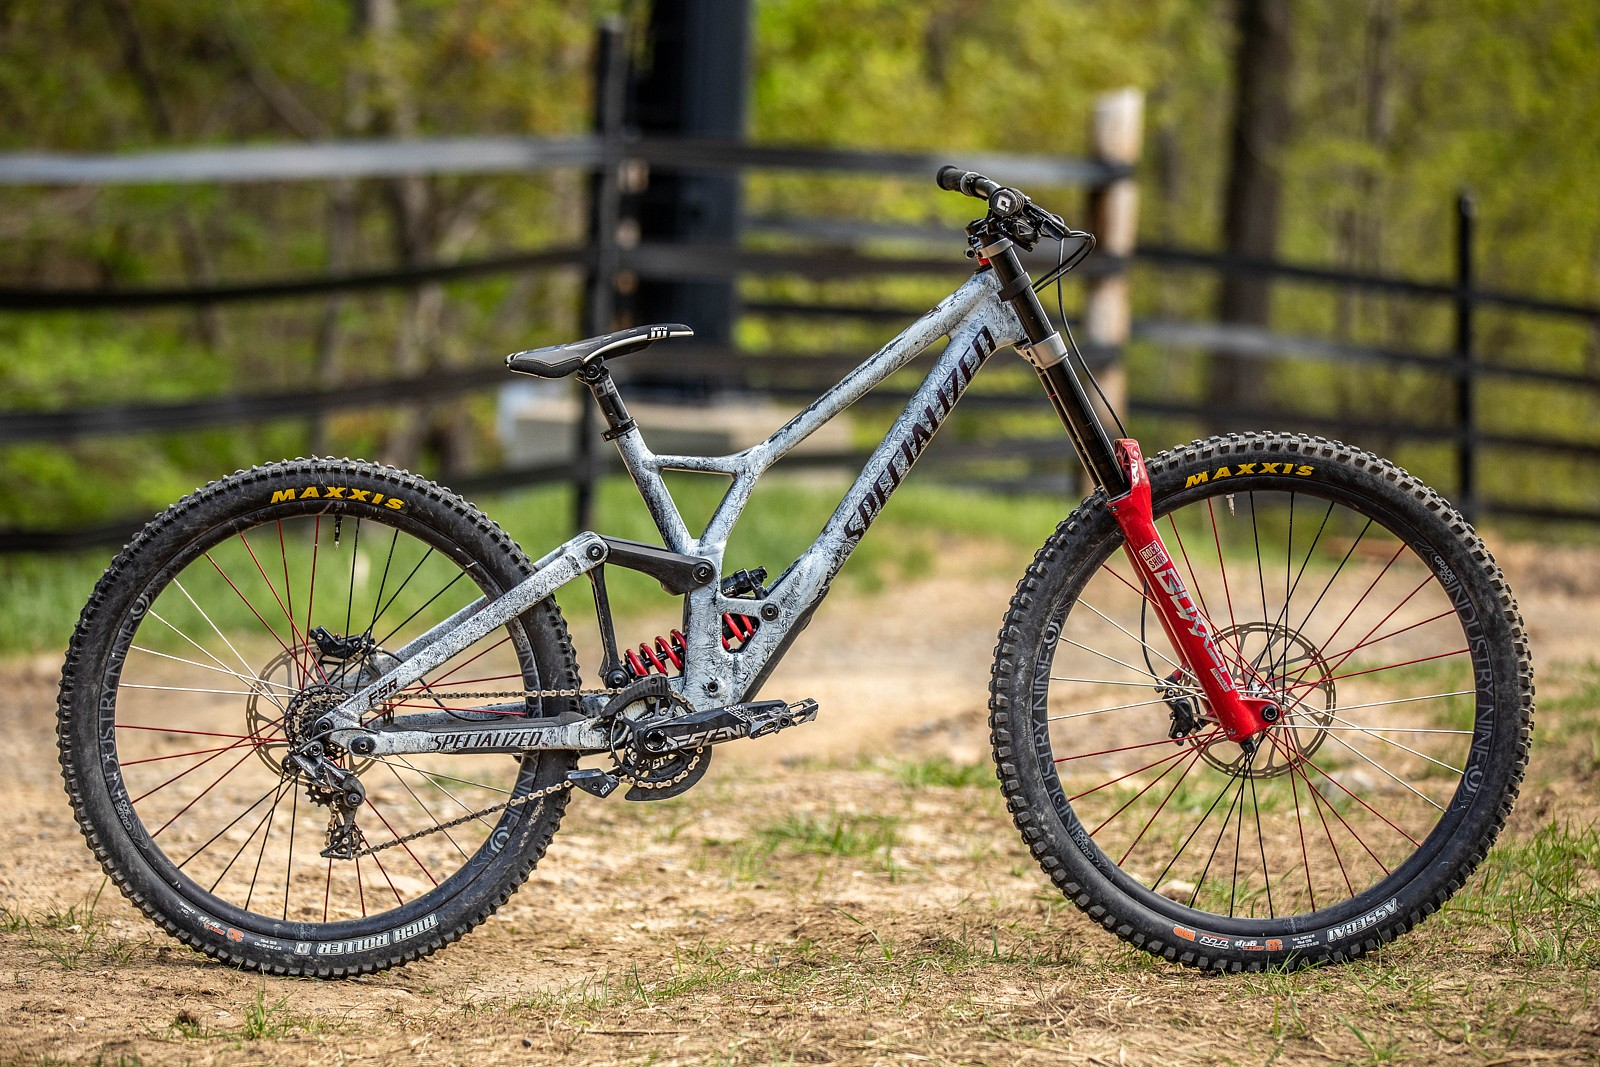 PIT BITS - Downhill Southeast Massanutten - Corey Jackson's Specialized Demo mullet. - JackRice - Mountain Biking Pictures - Vital MTB